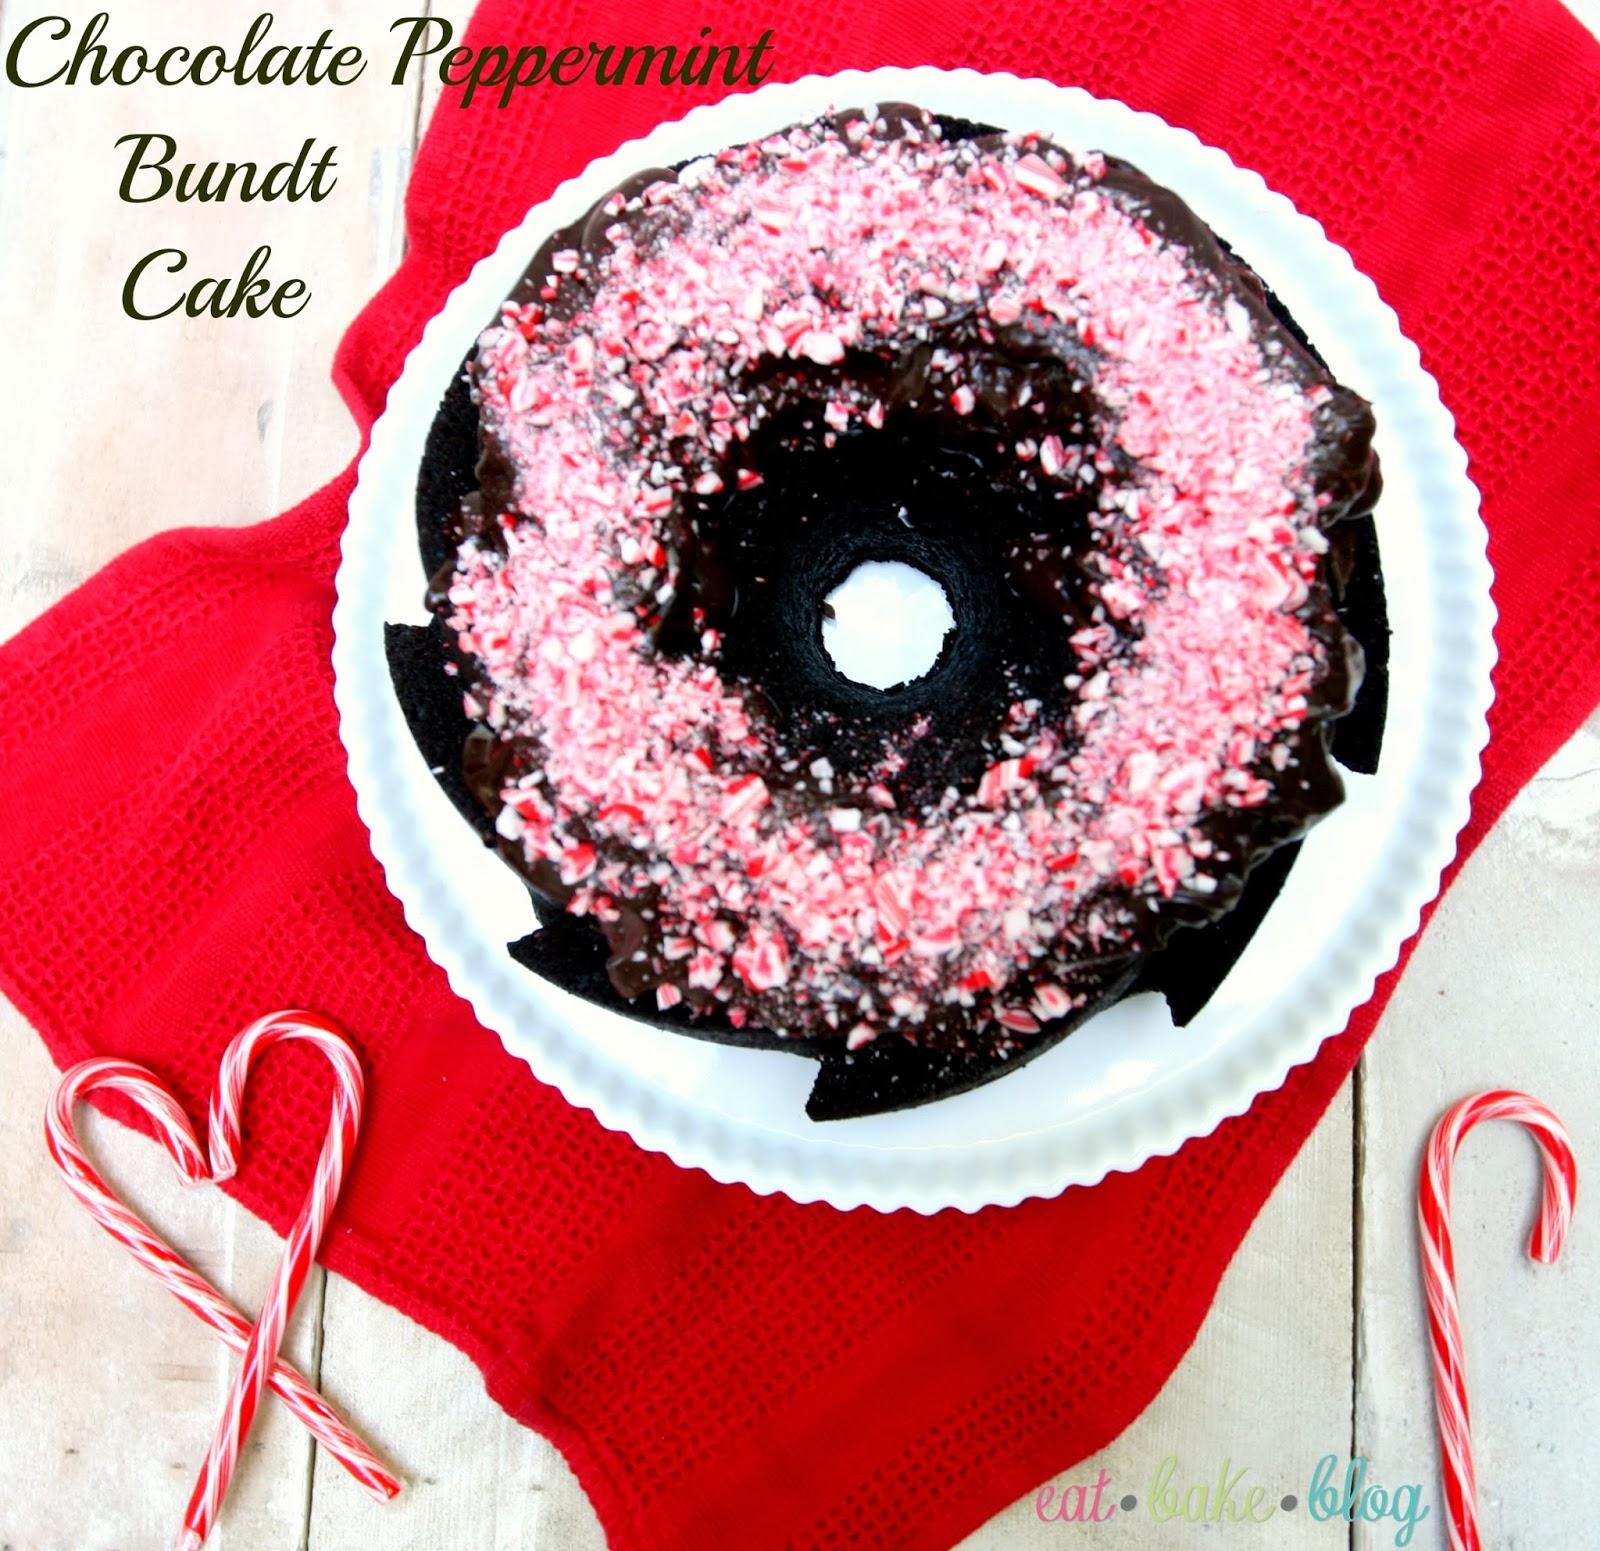 ... cake recipe Christmas bundt cake recipe chocolate peppermint cake